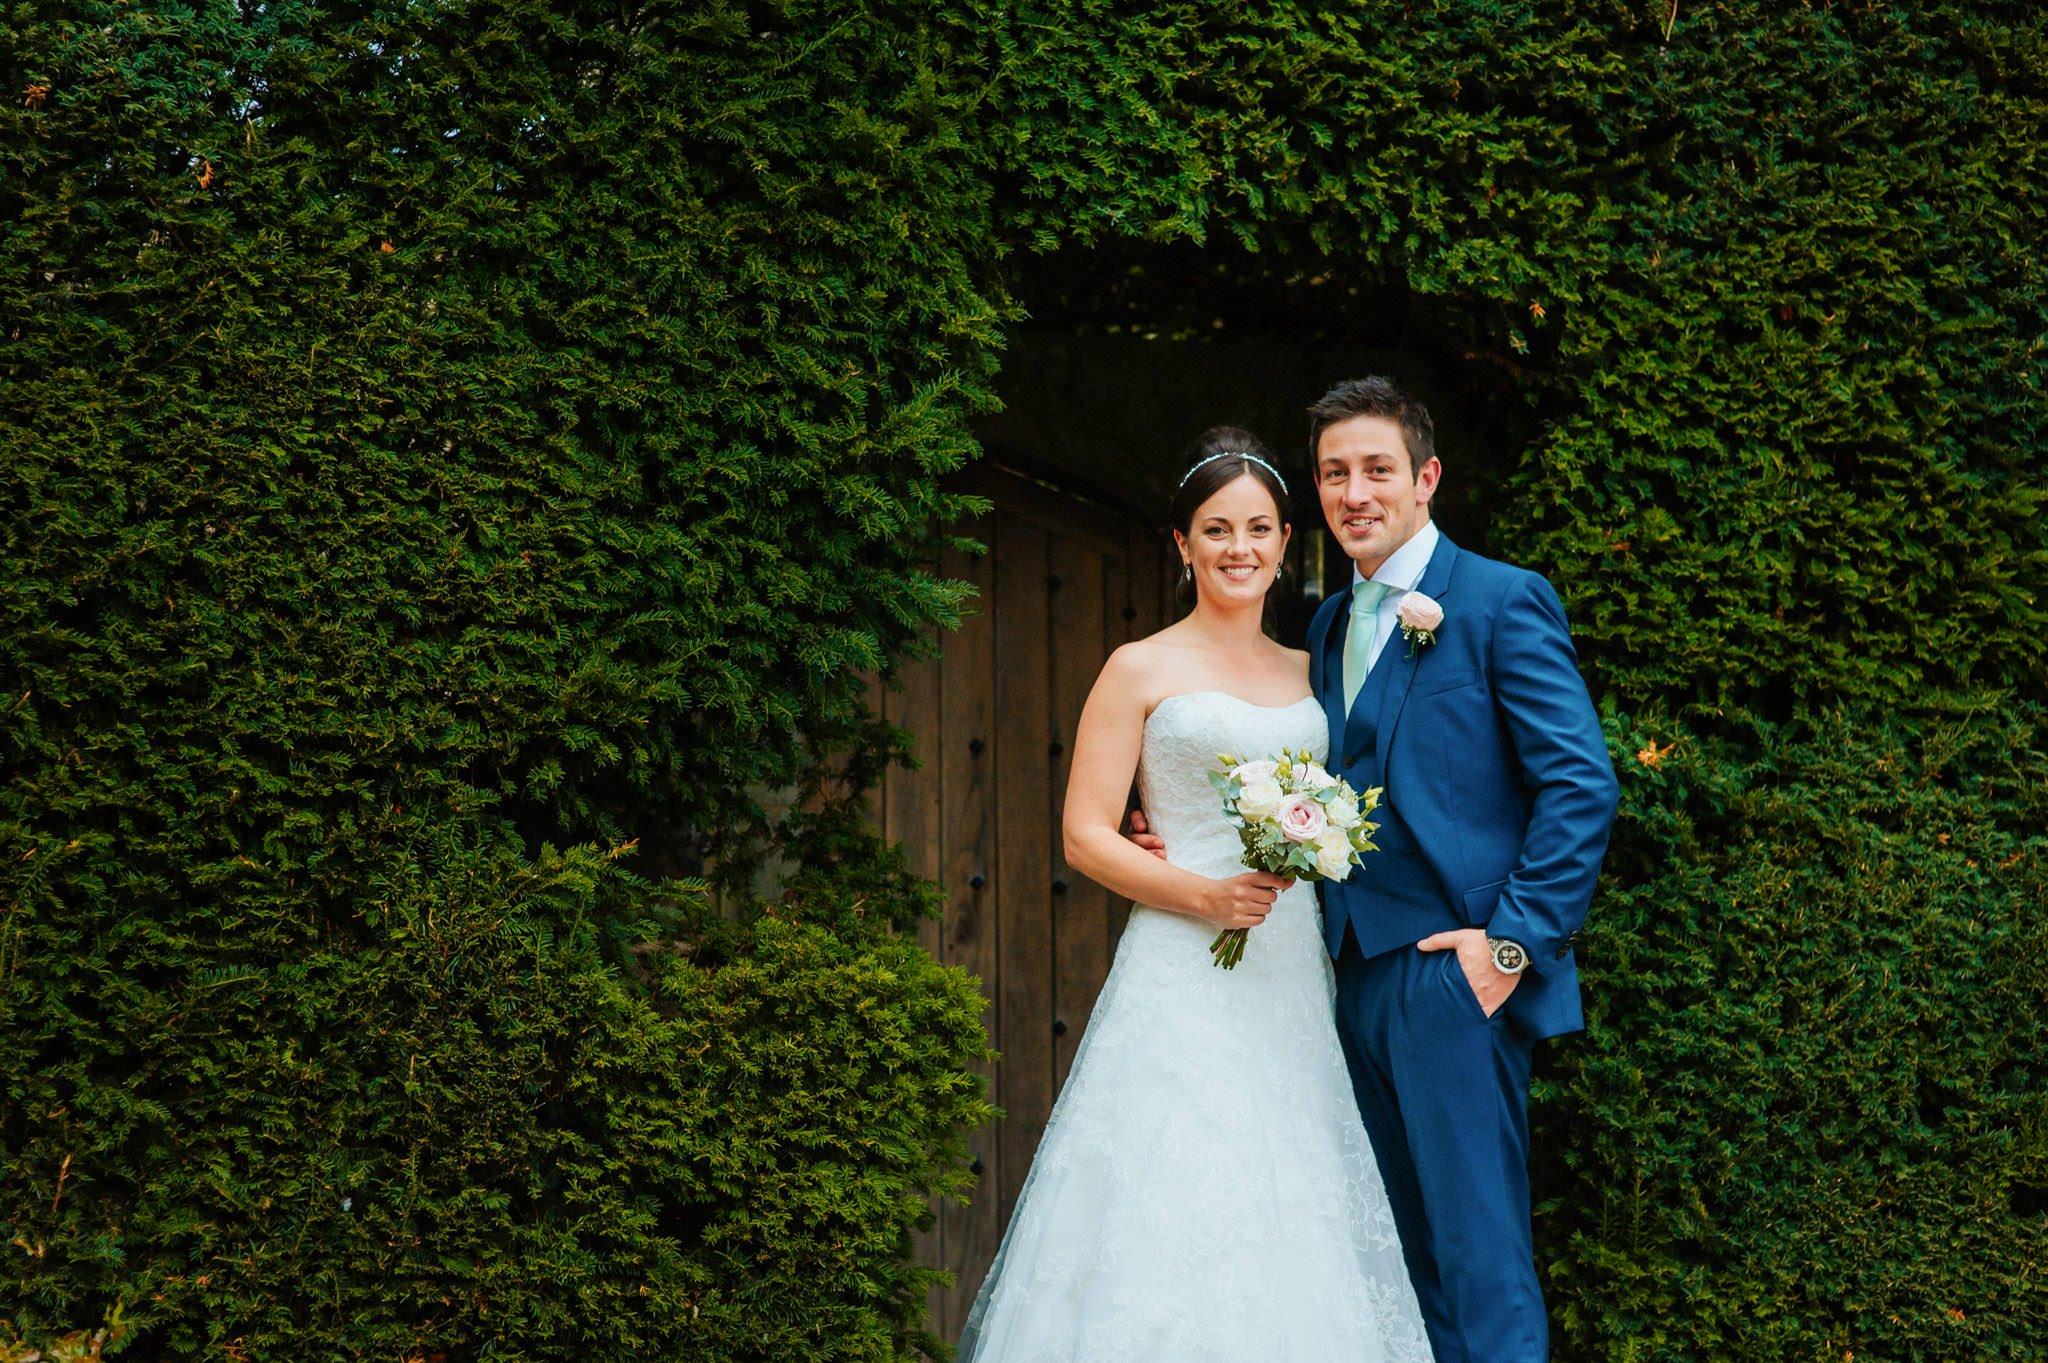 Eastnor Castle wedding photographer Herefordshire, West Midlands - Sarah + Dean 40